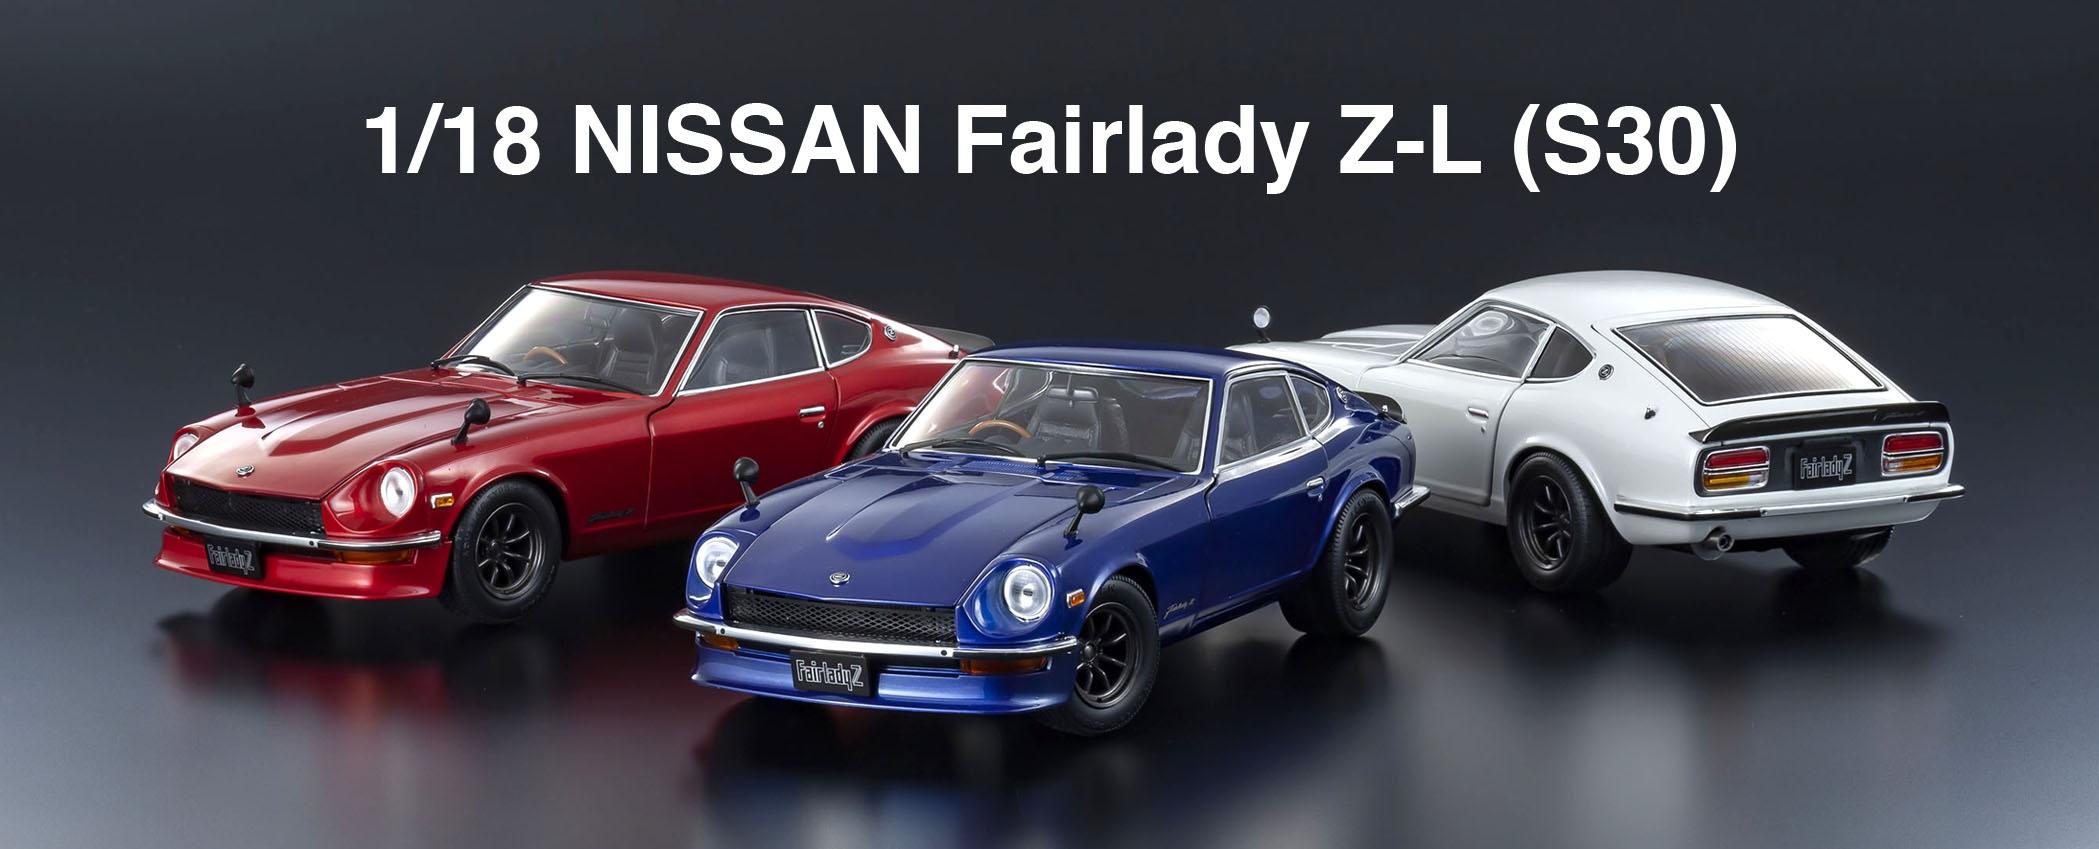 Fairlady series